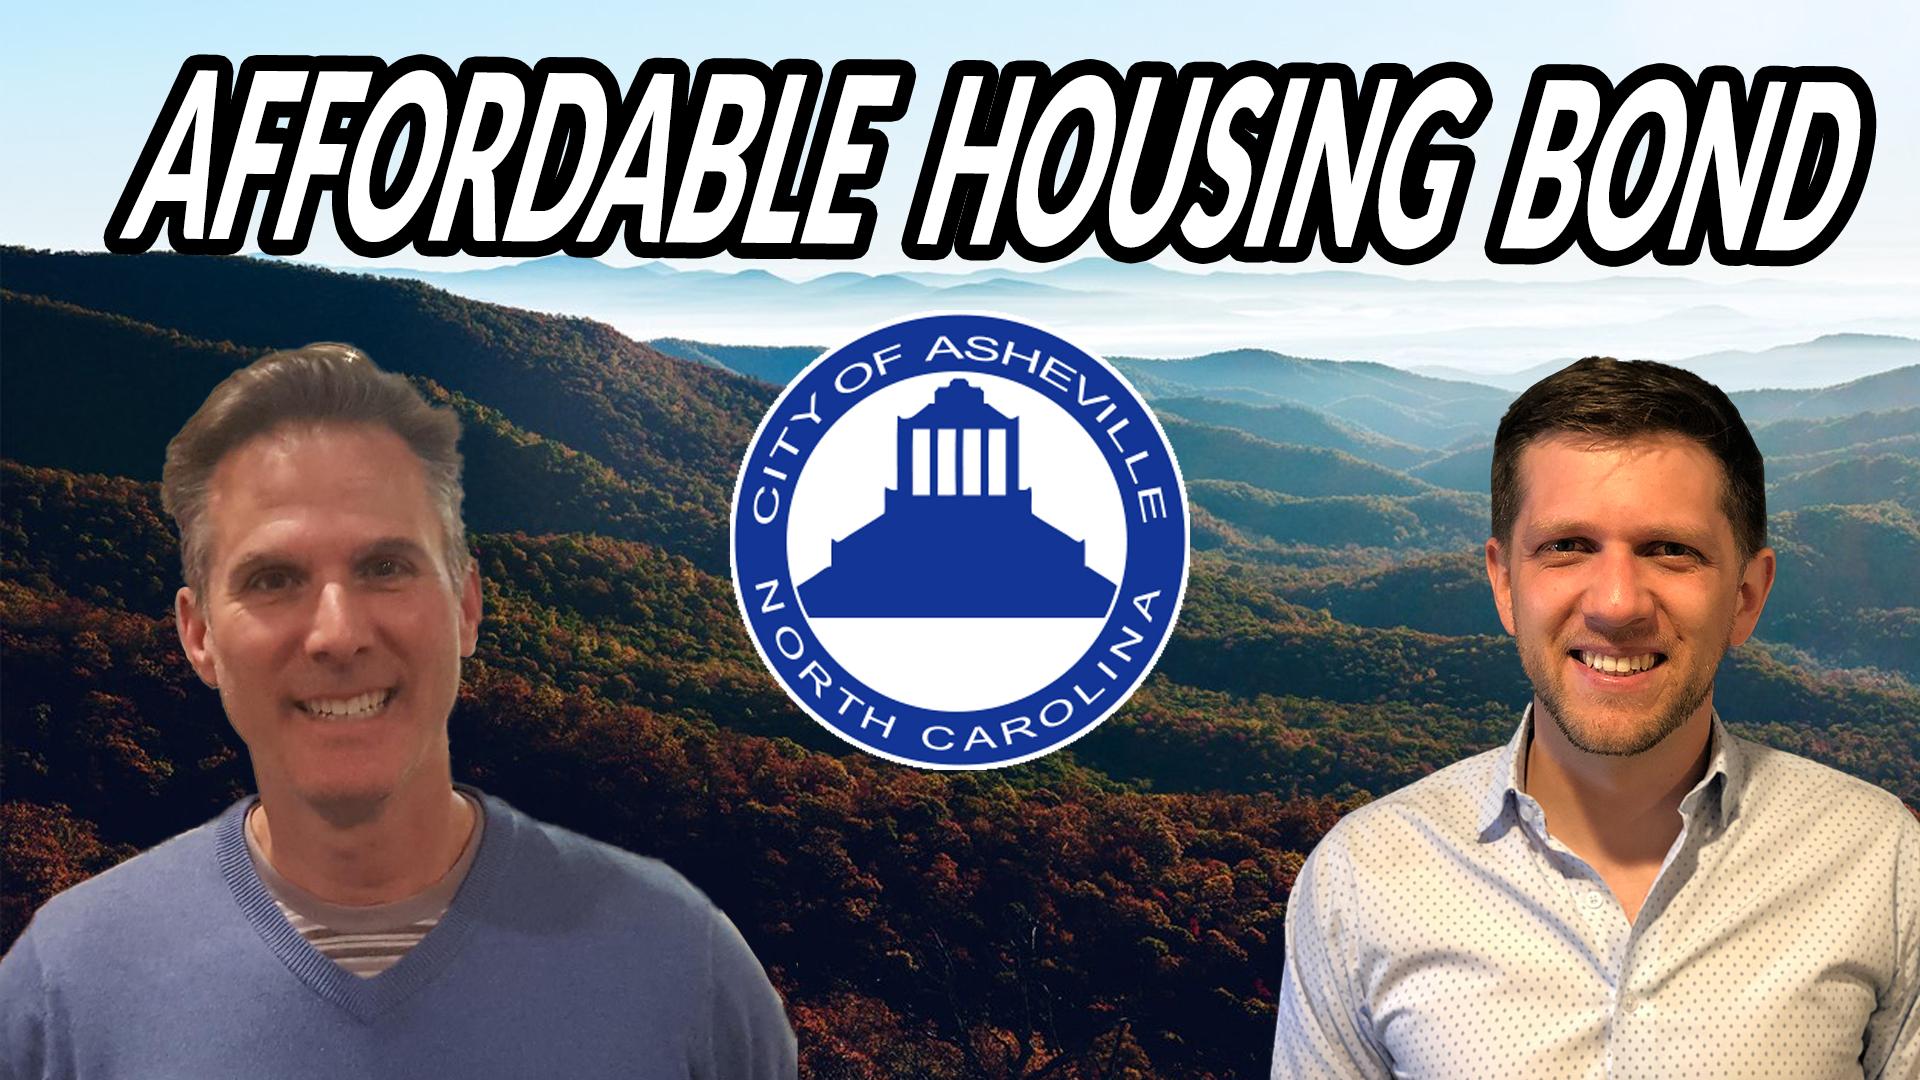 THE CITY OF ASHEVILLE'S AFFORDABLE HOUSING BOND | AREN 93